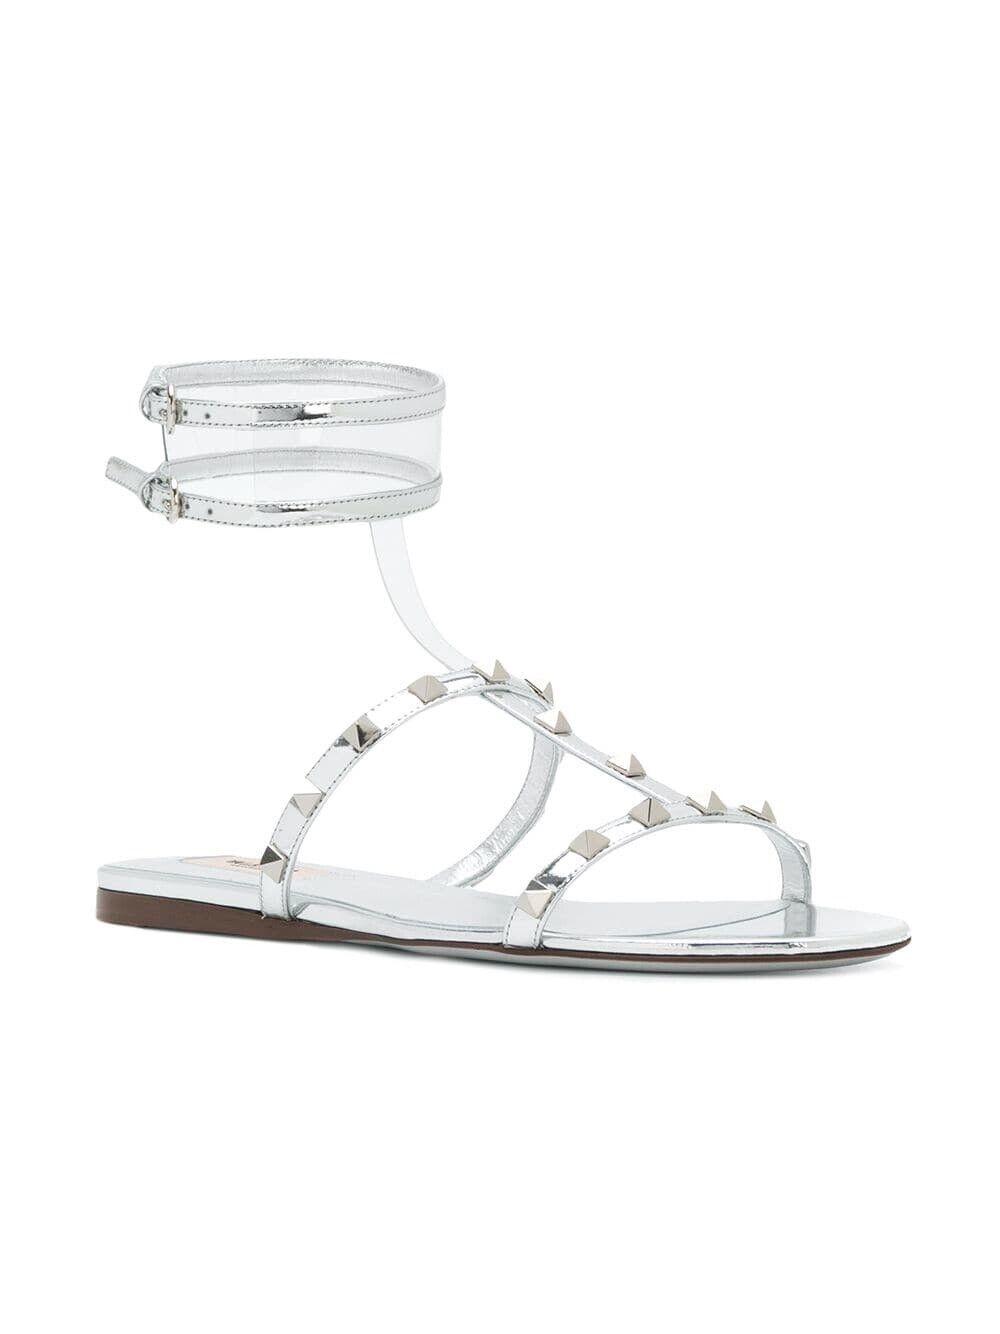 Valentino Moonwalk Rockstud Ankle Strap Gladiator Flat Sandals 36EU 6US  795.00